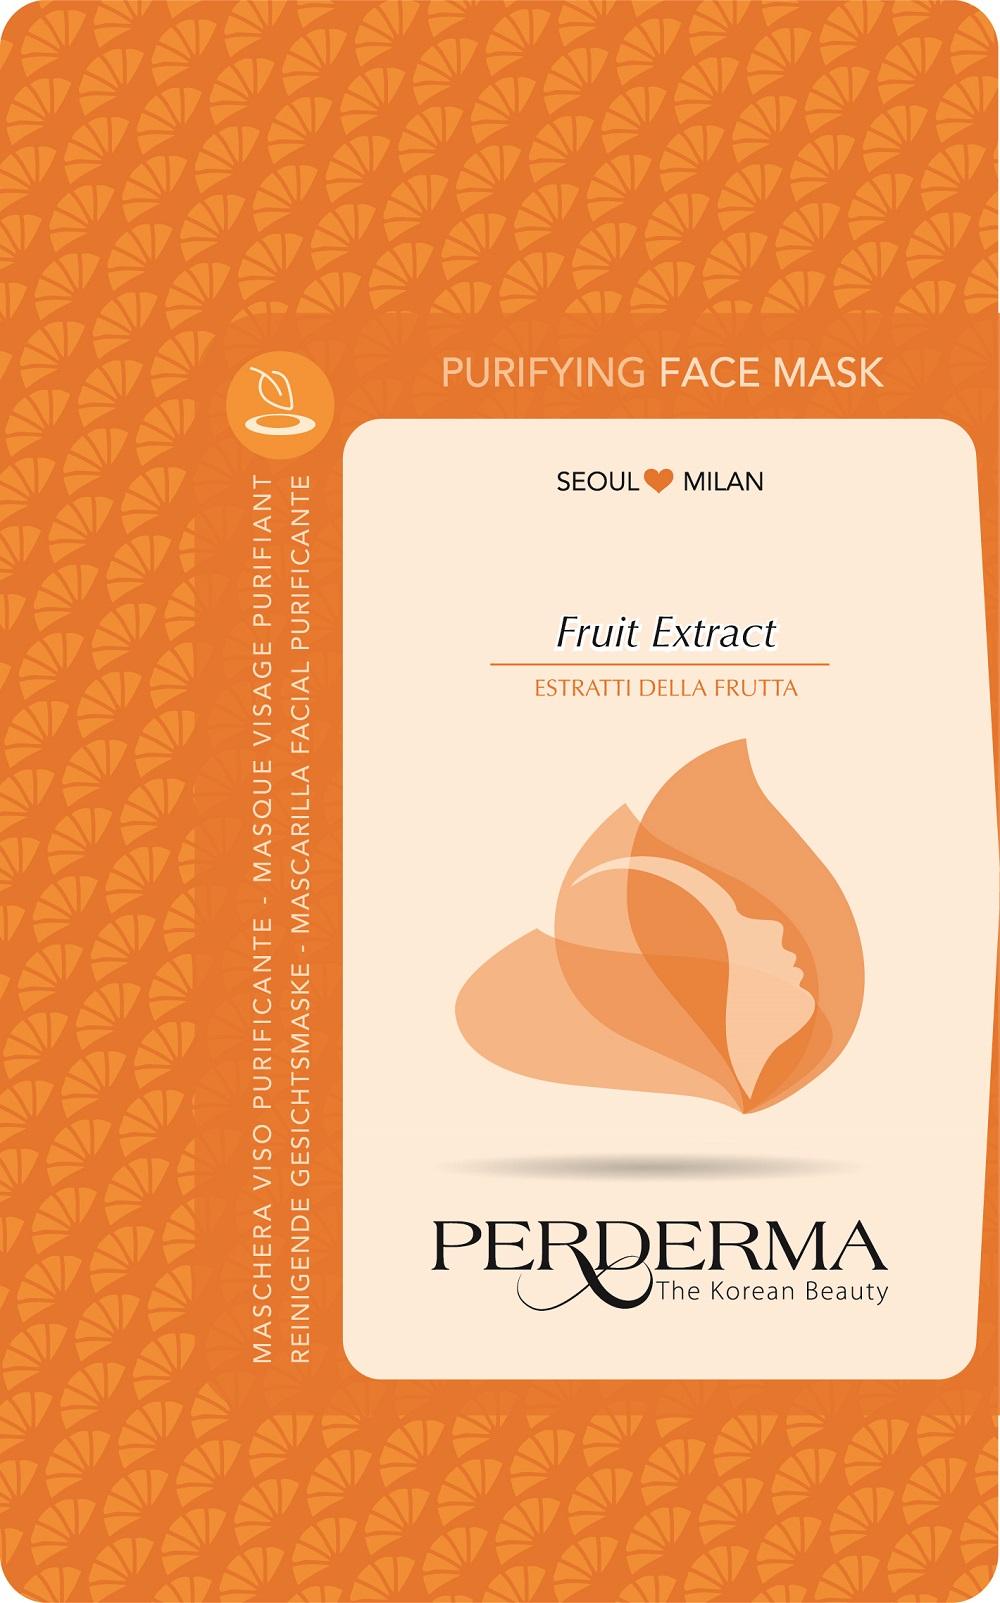 Maschera viso PERDERMA purificante